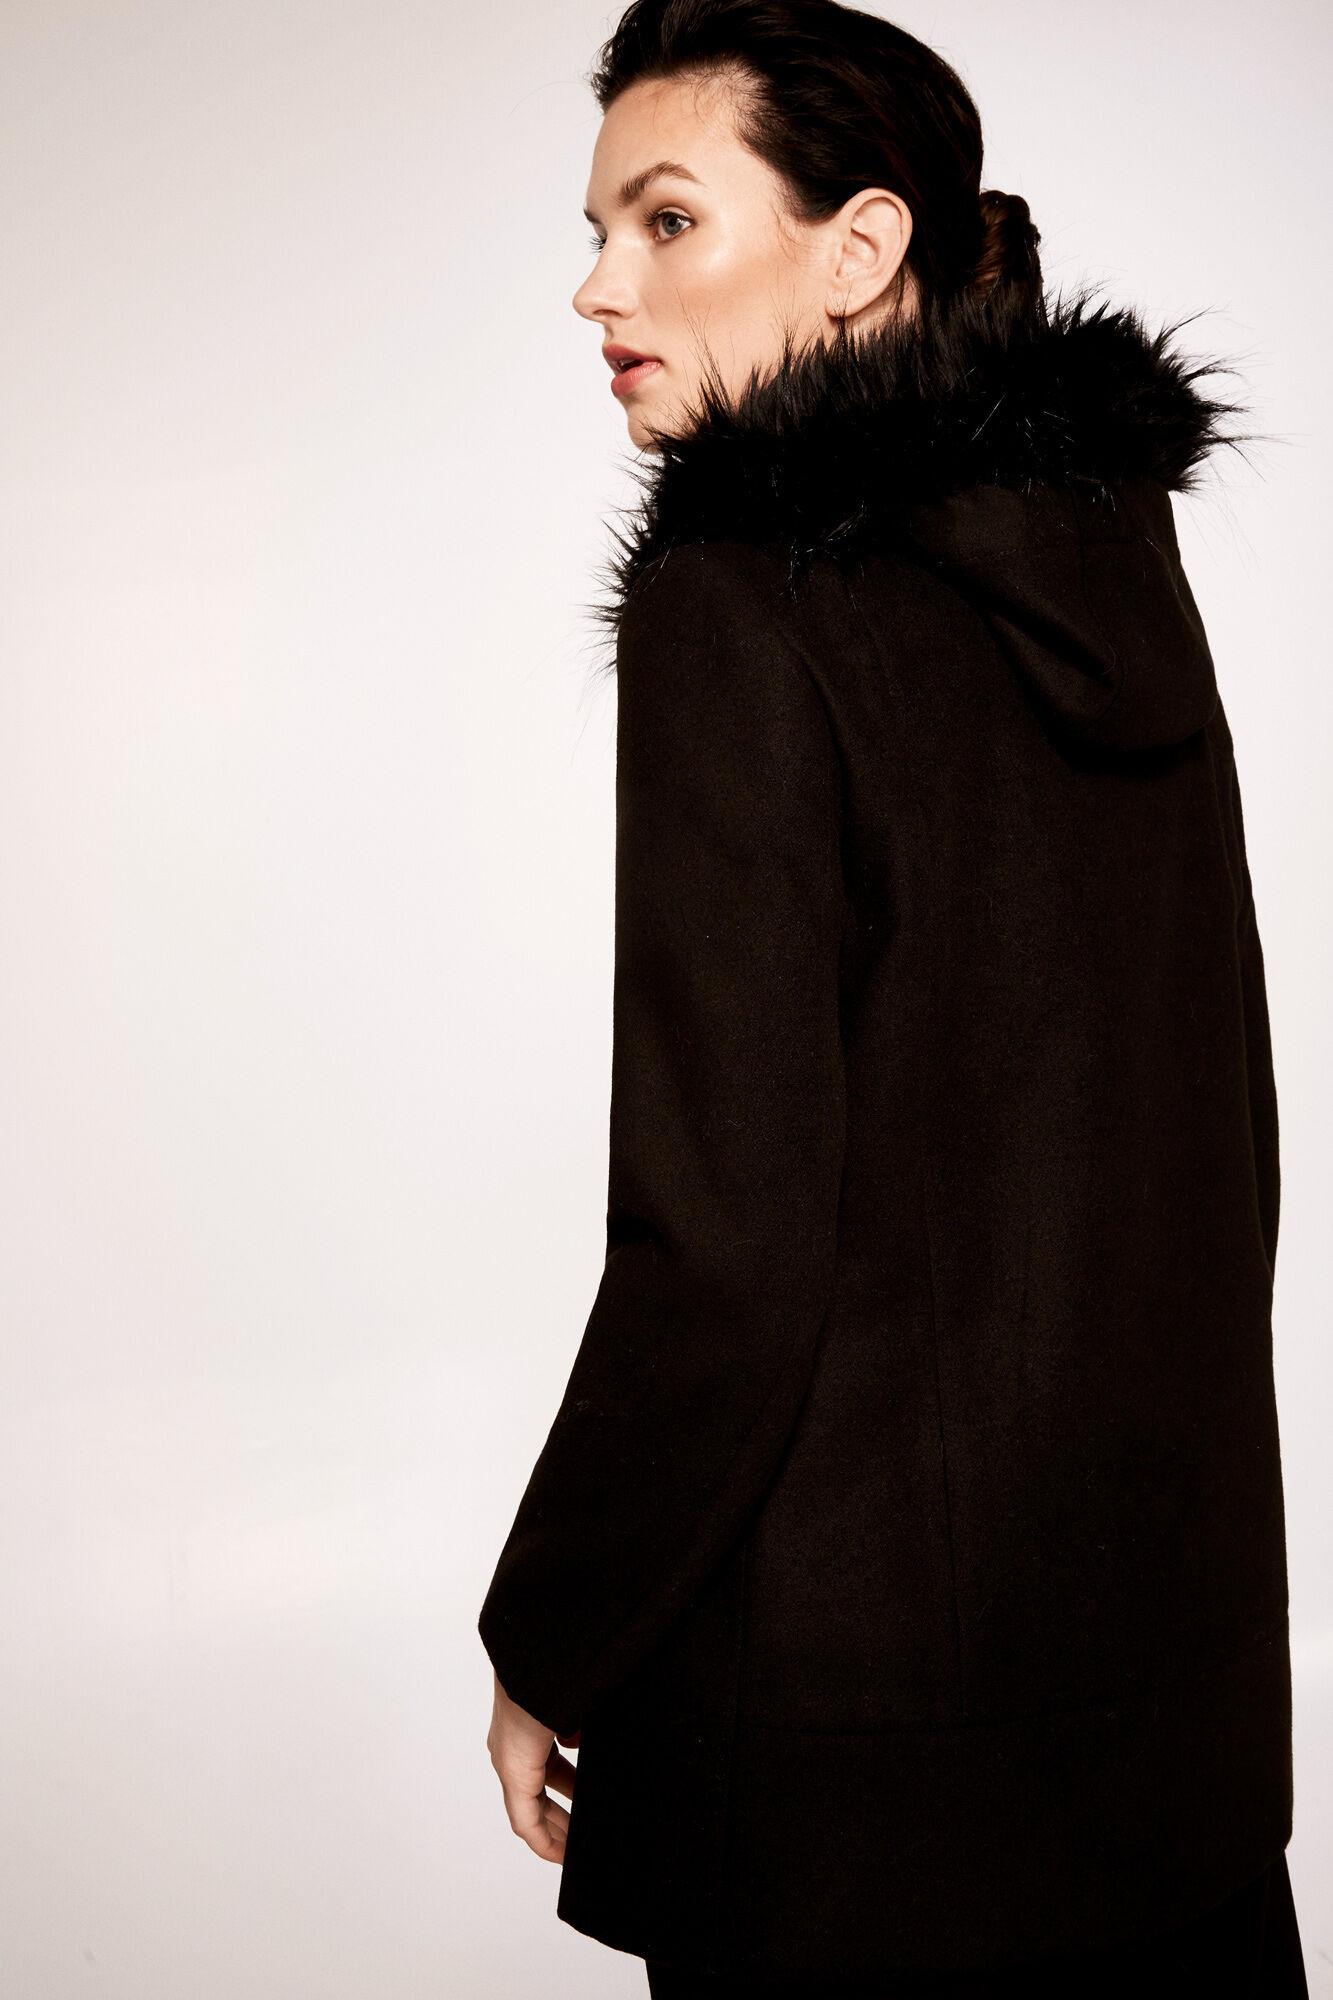 Duffle coat with fur hood | Coats and parkas | Cortefiel Man & Woman